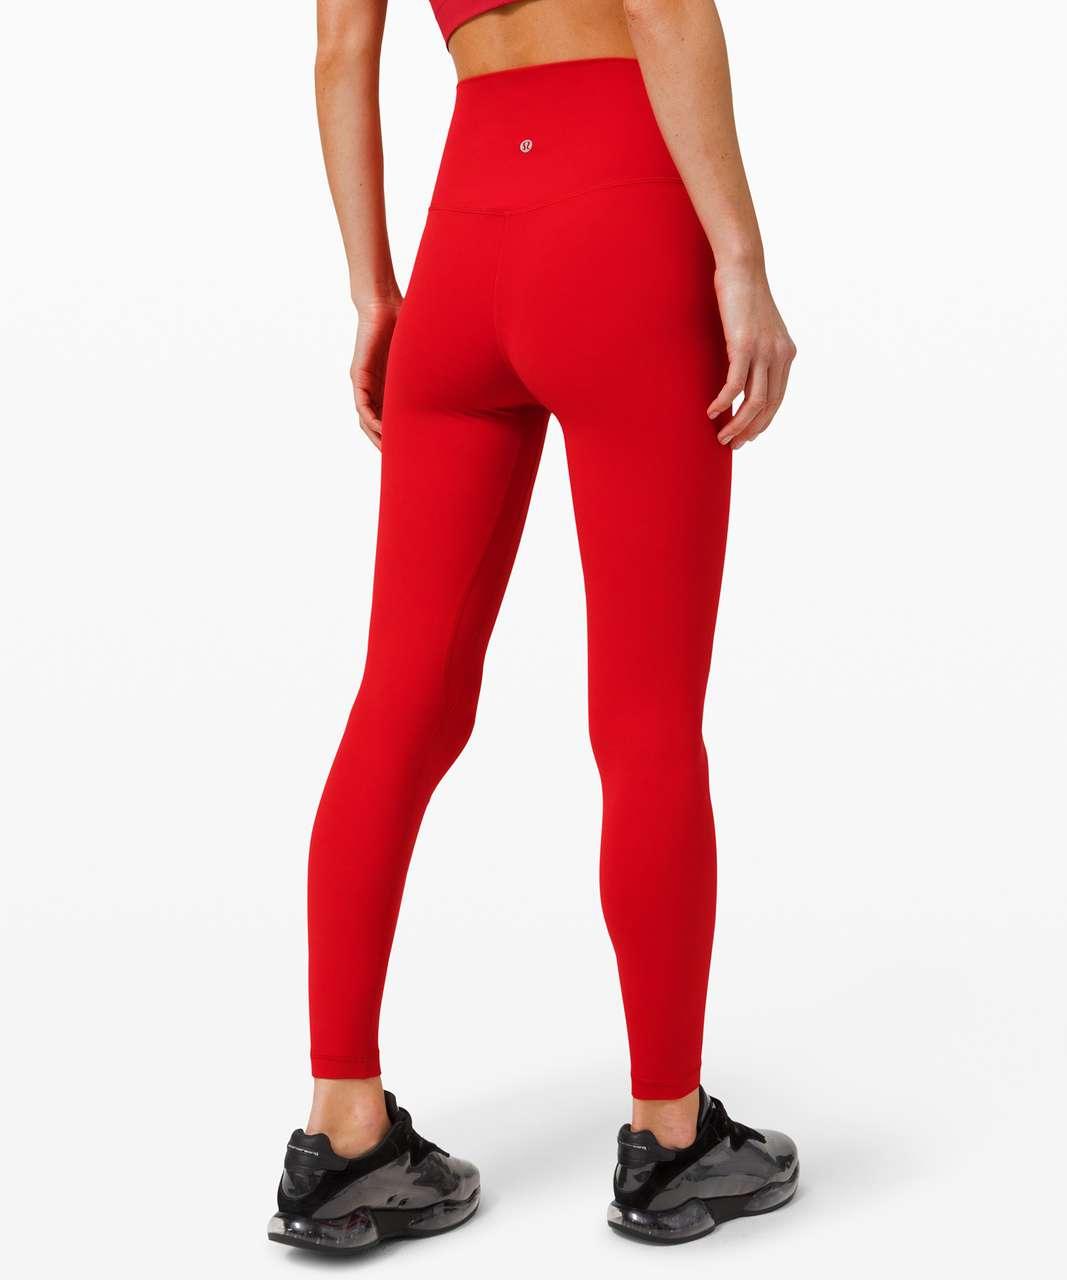 "Lululemon Align Pant 28"" - Dark Red"